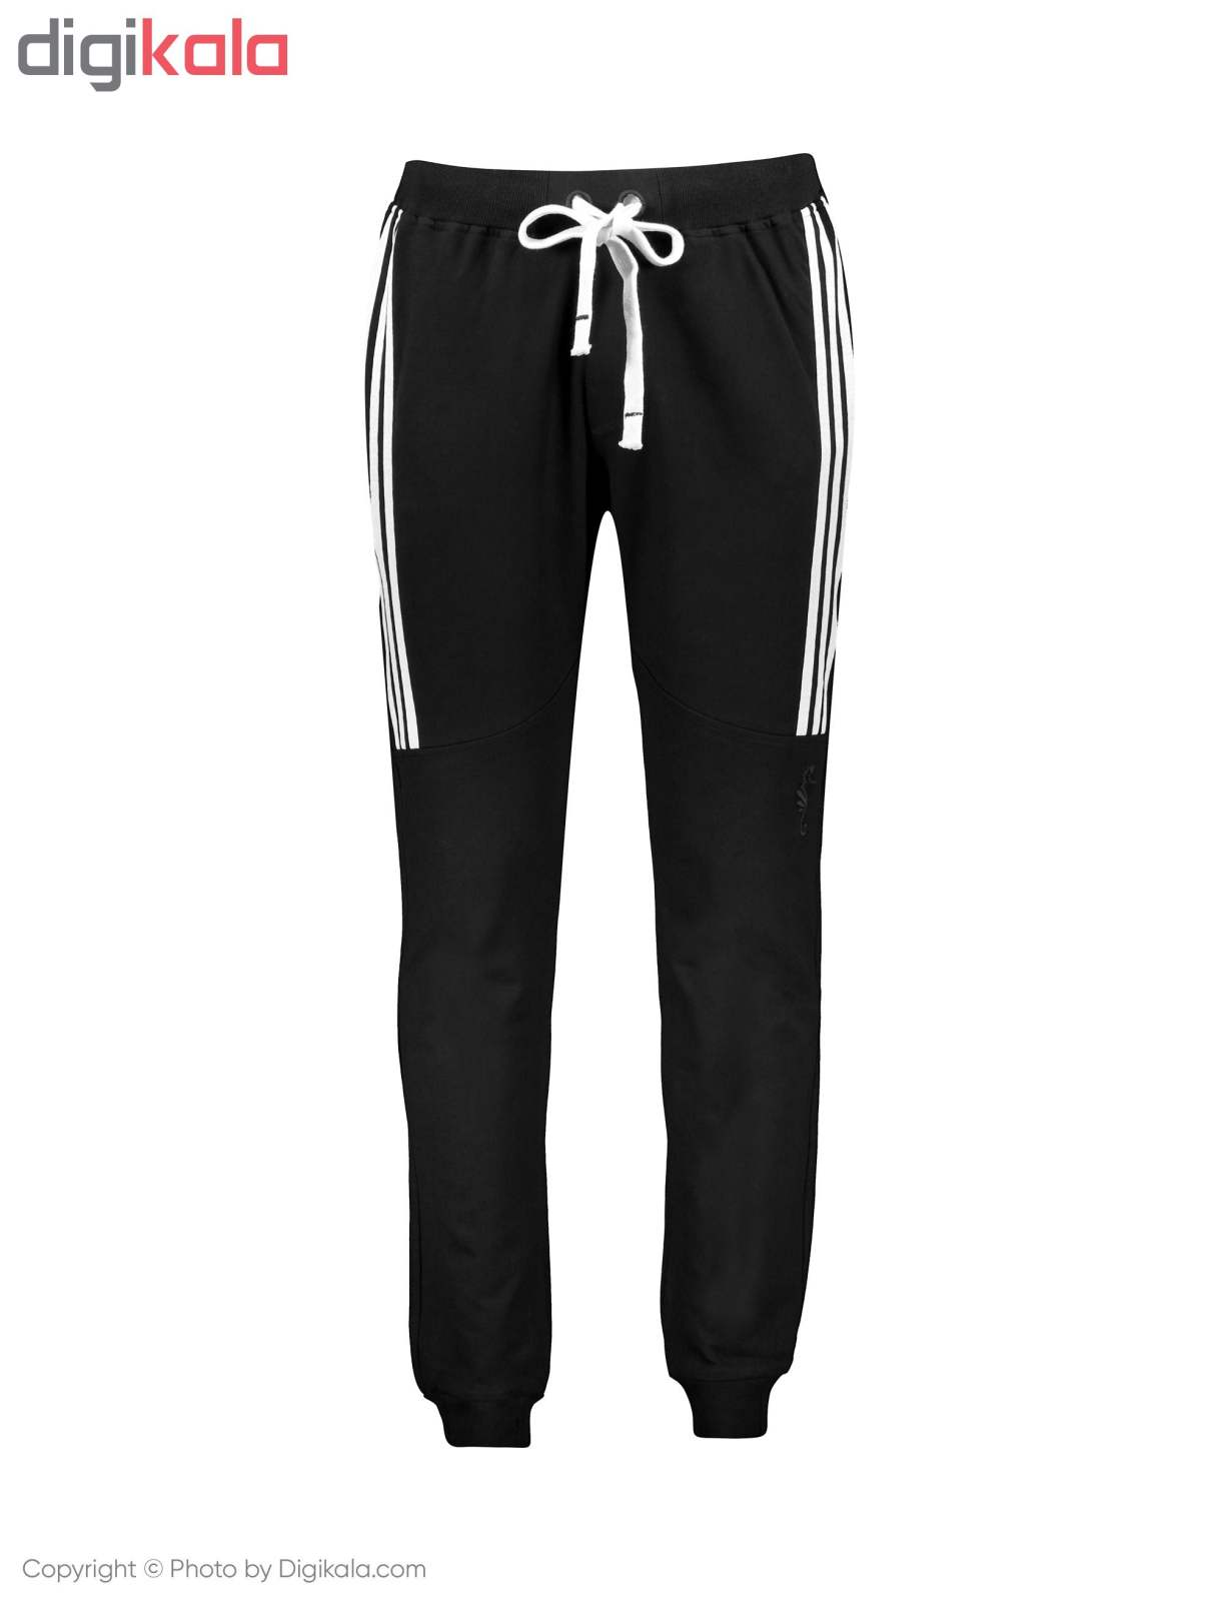 شلوار مردانه زی مدل 153113399  Zi 153113399 Trousers For Men